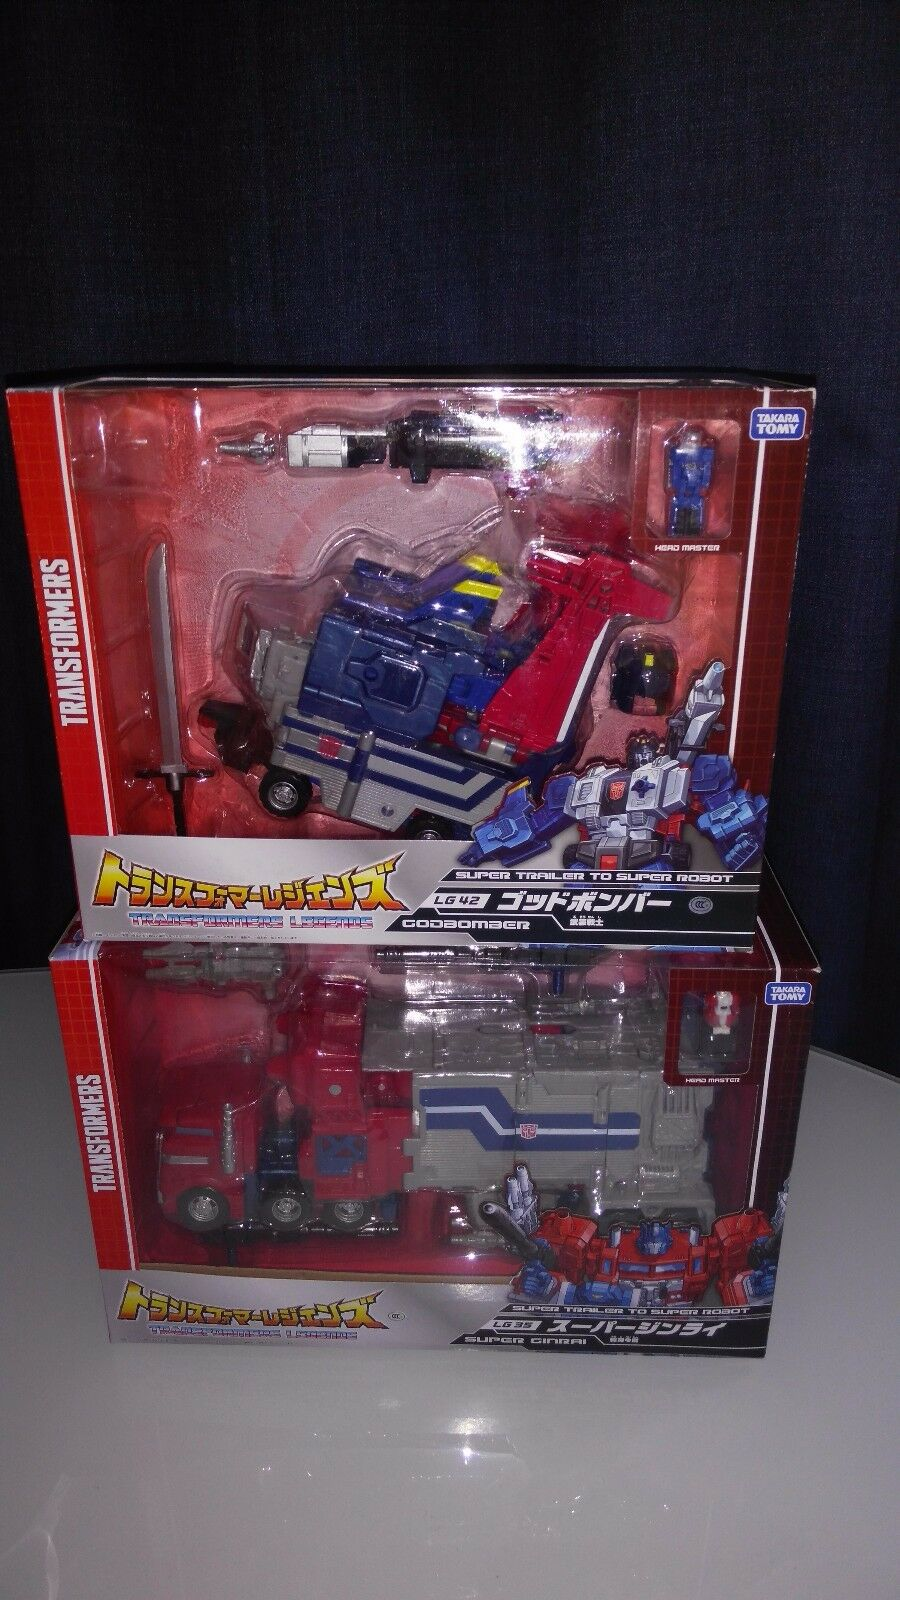 Transformers leyendas LG35 Ginrai LG42 godbomber Masterforce Masterforce Masterforce Menta en Caja Sellada  bajo precio